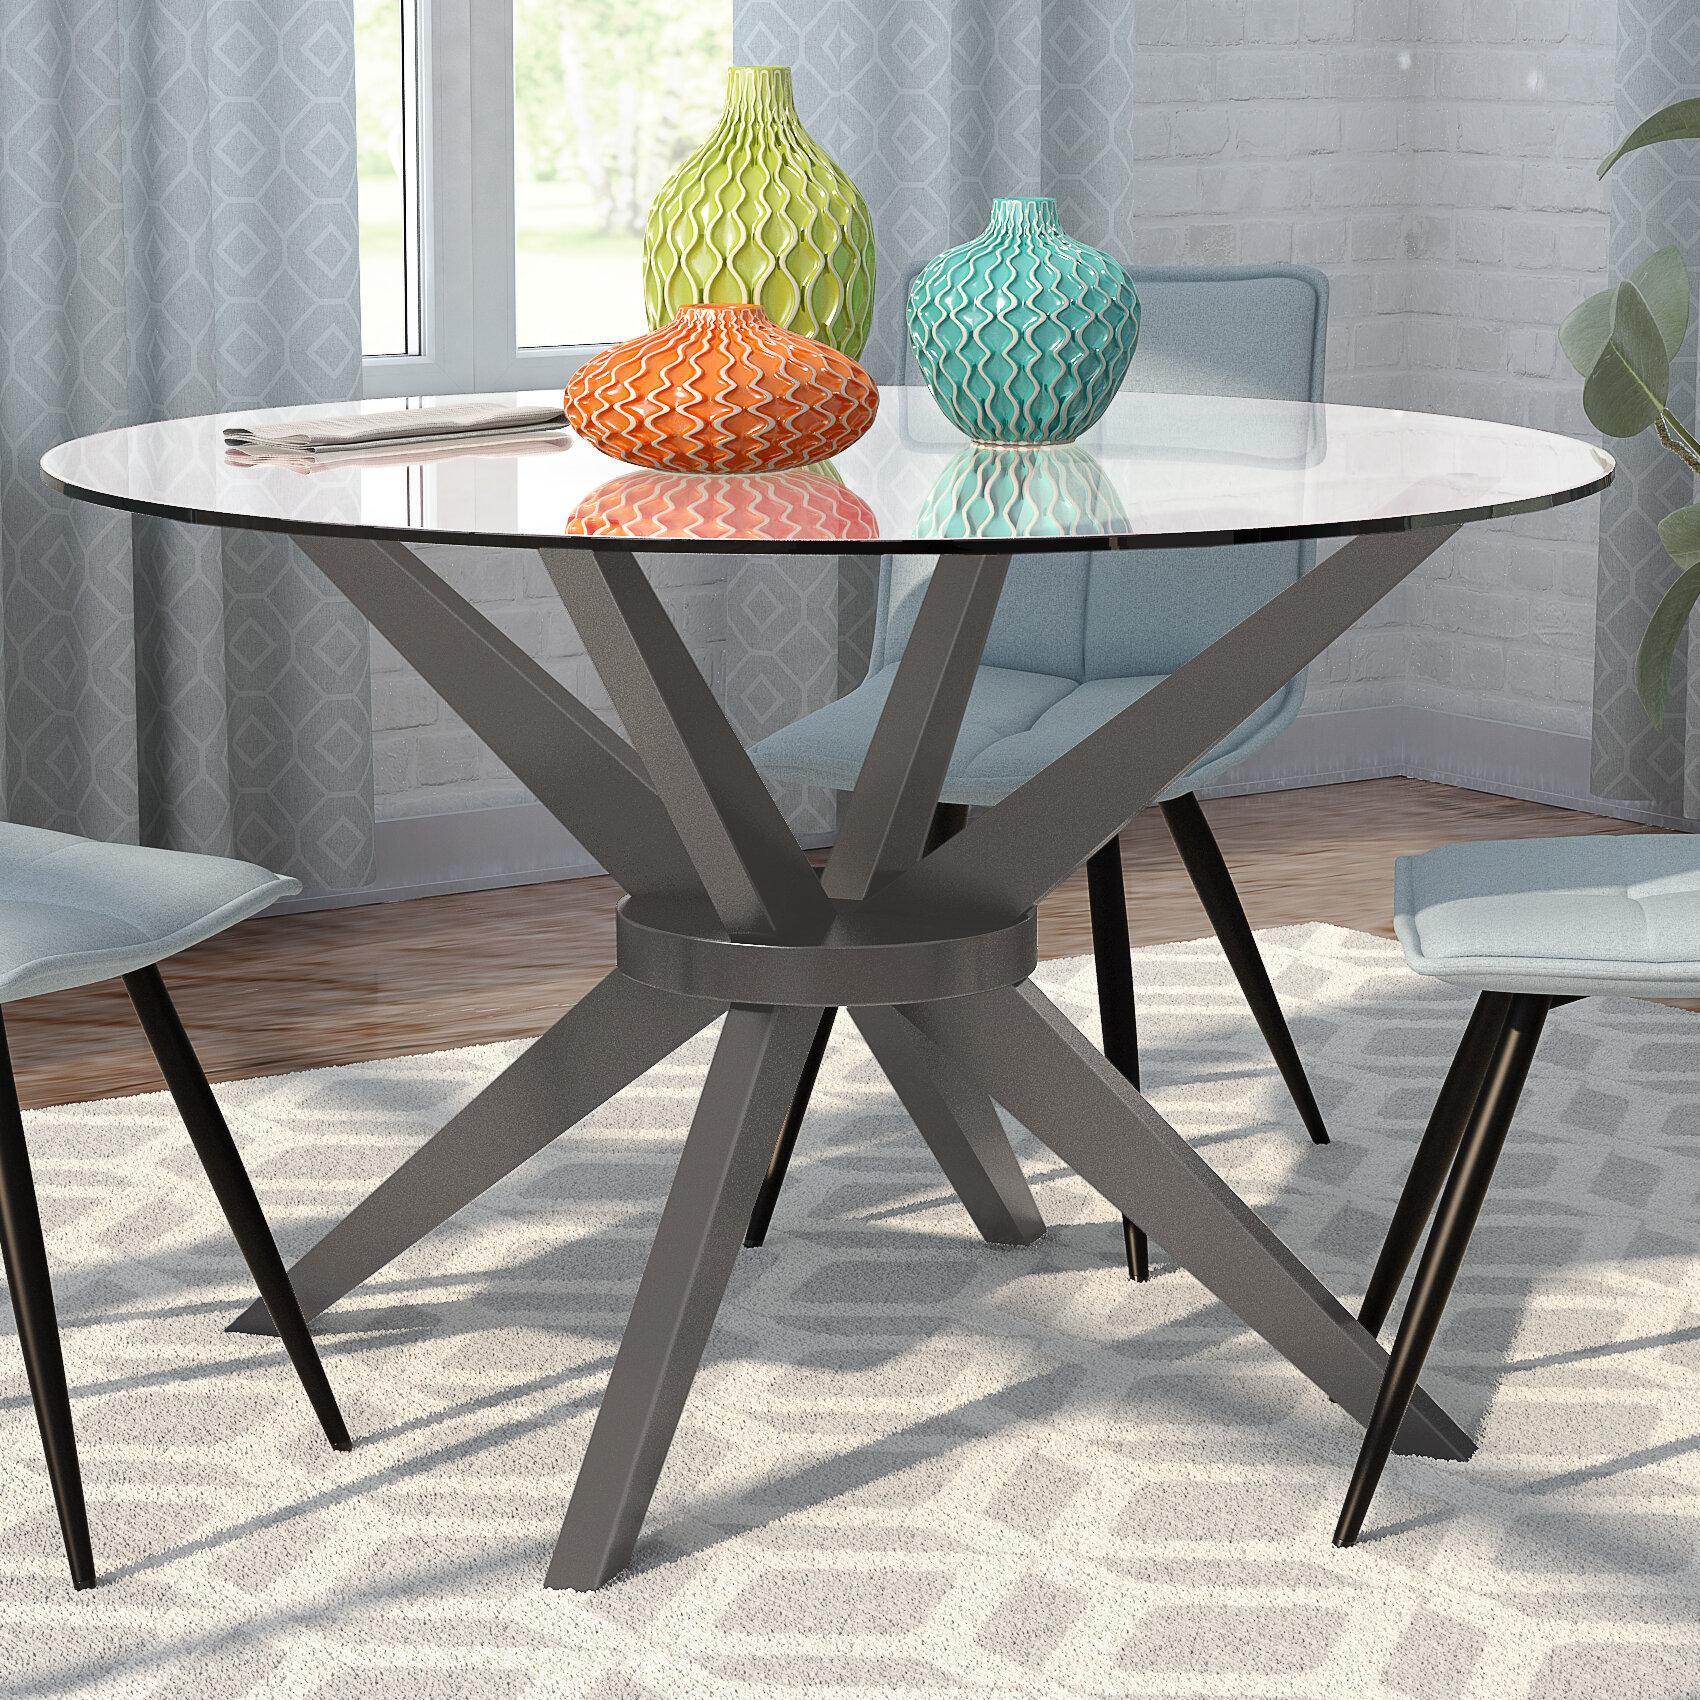 Mercury Row Gochenour Dining Table Reviews Wayfair - Table pads columbus ohio